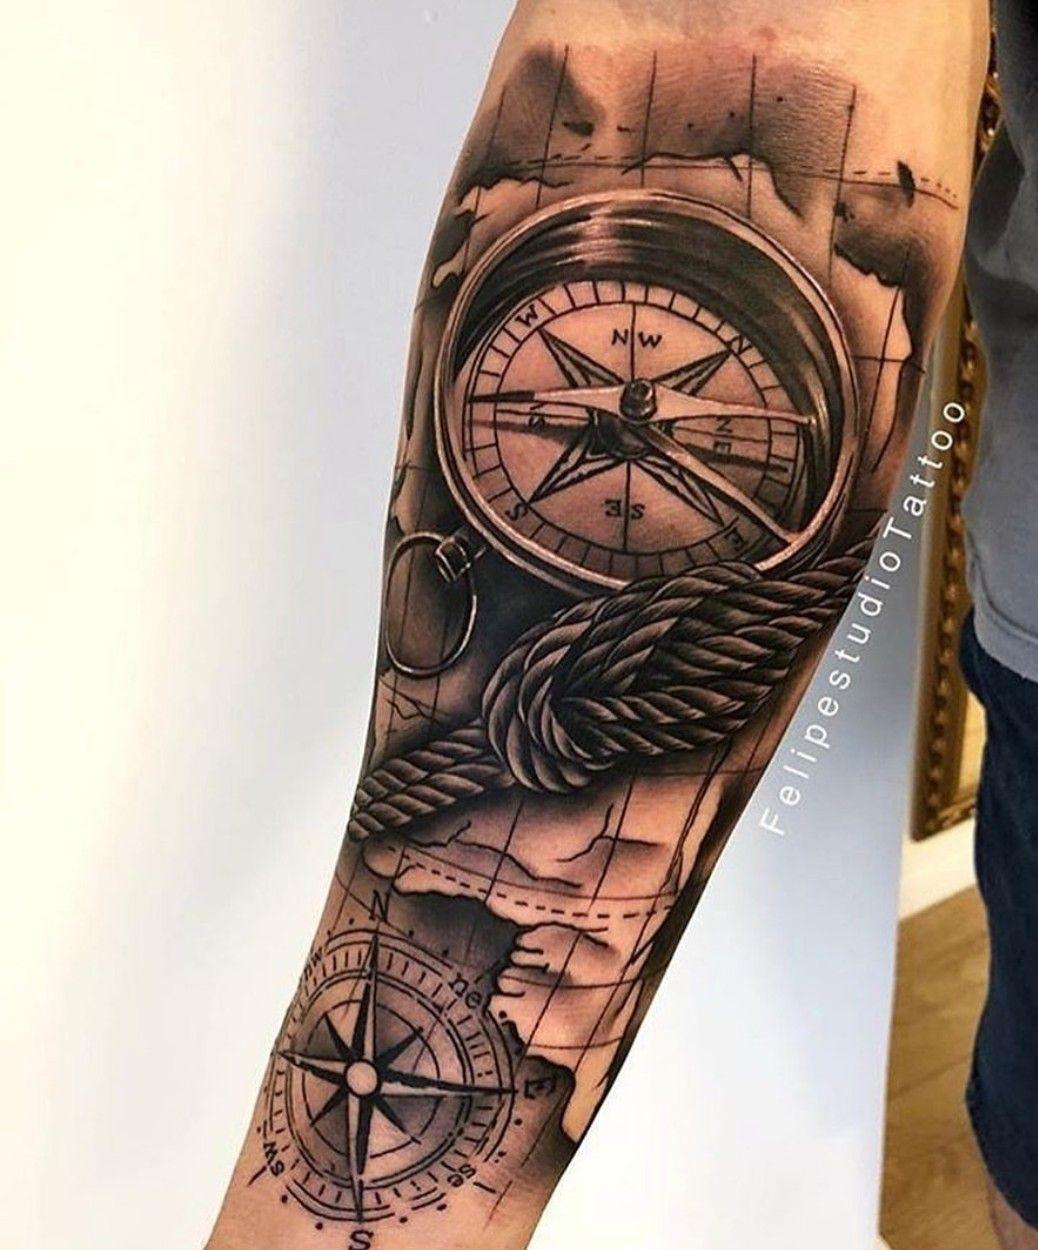 Tatuaje Brujula Tatuagem Masculina Tatuagem Masculina Braco